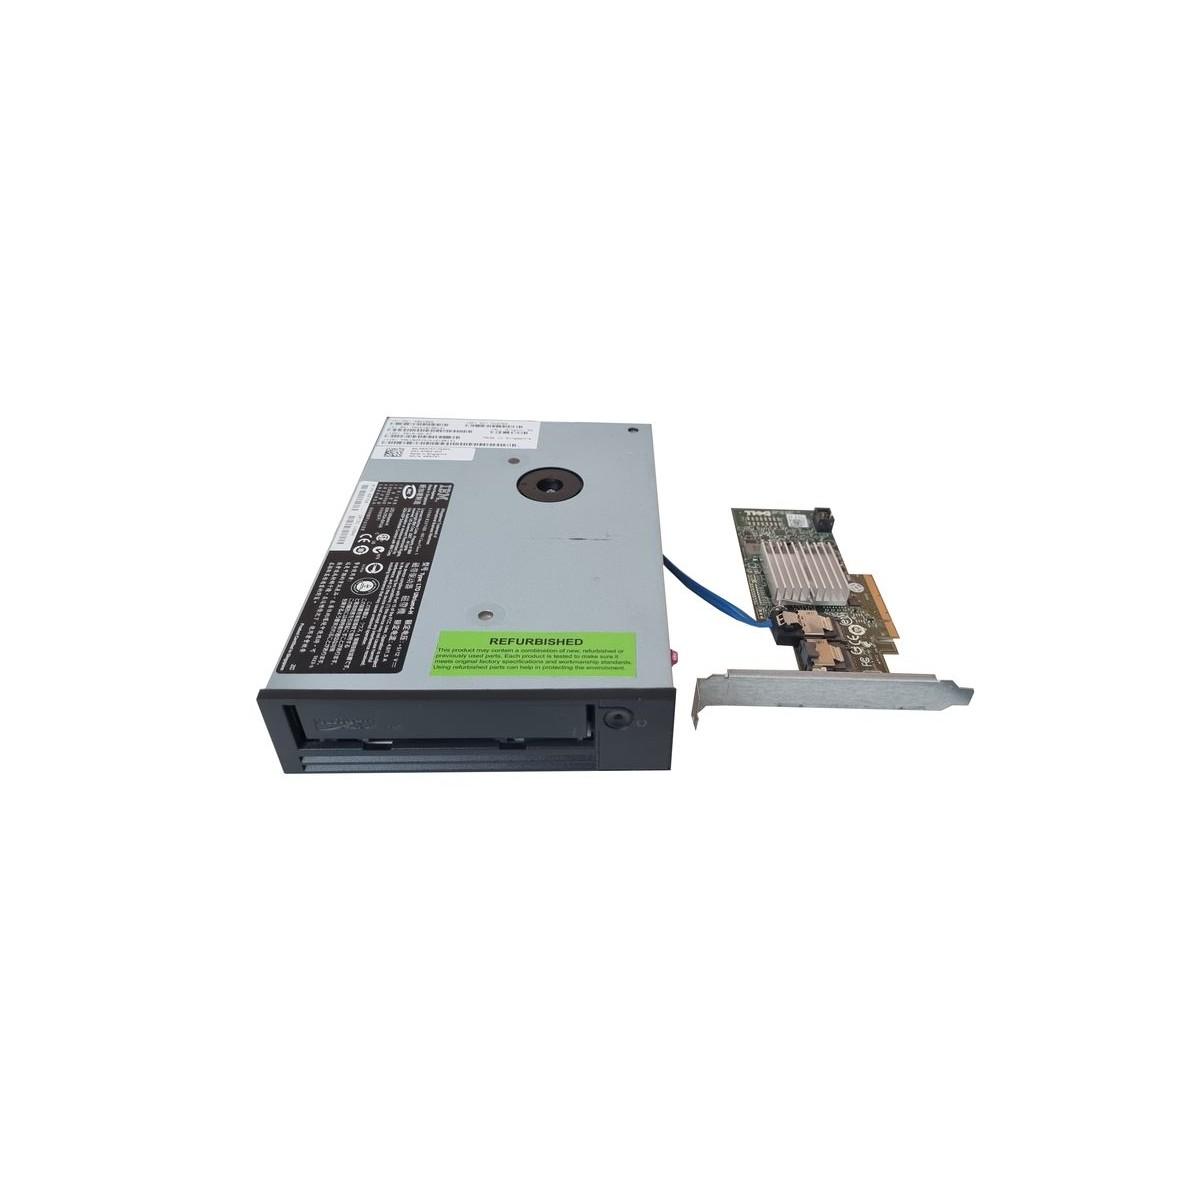 PAMIEC QIMONDA 1GB 2Rx8 PC2-4200F HYS72T128020HFN